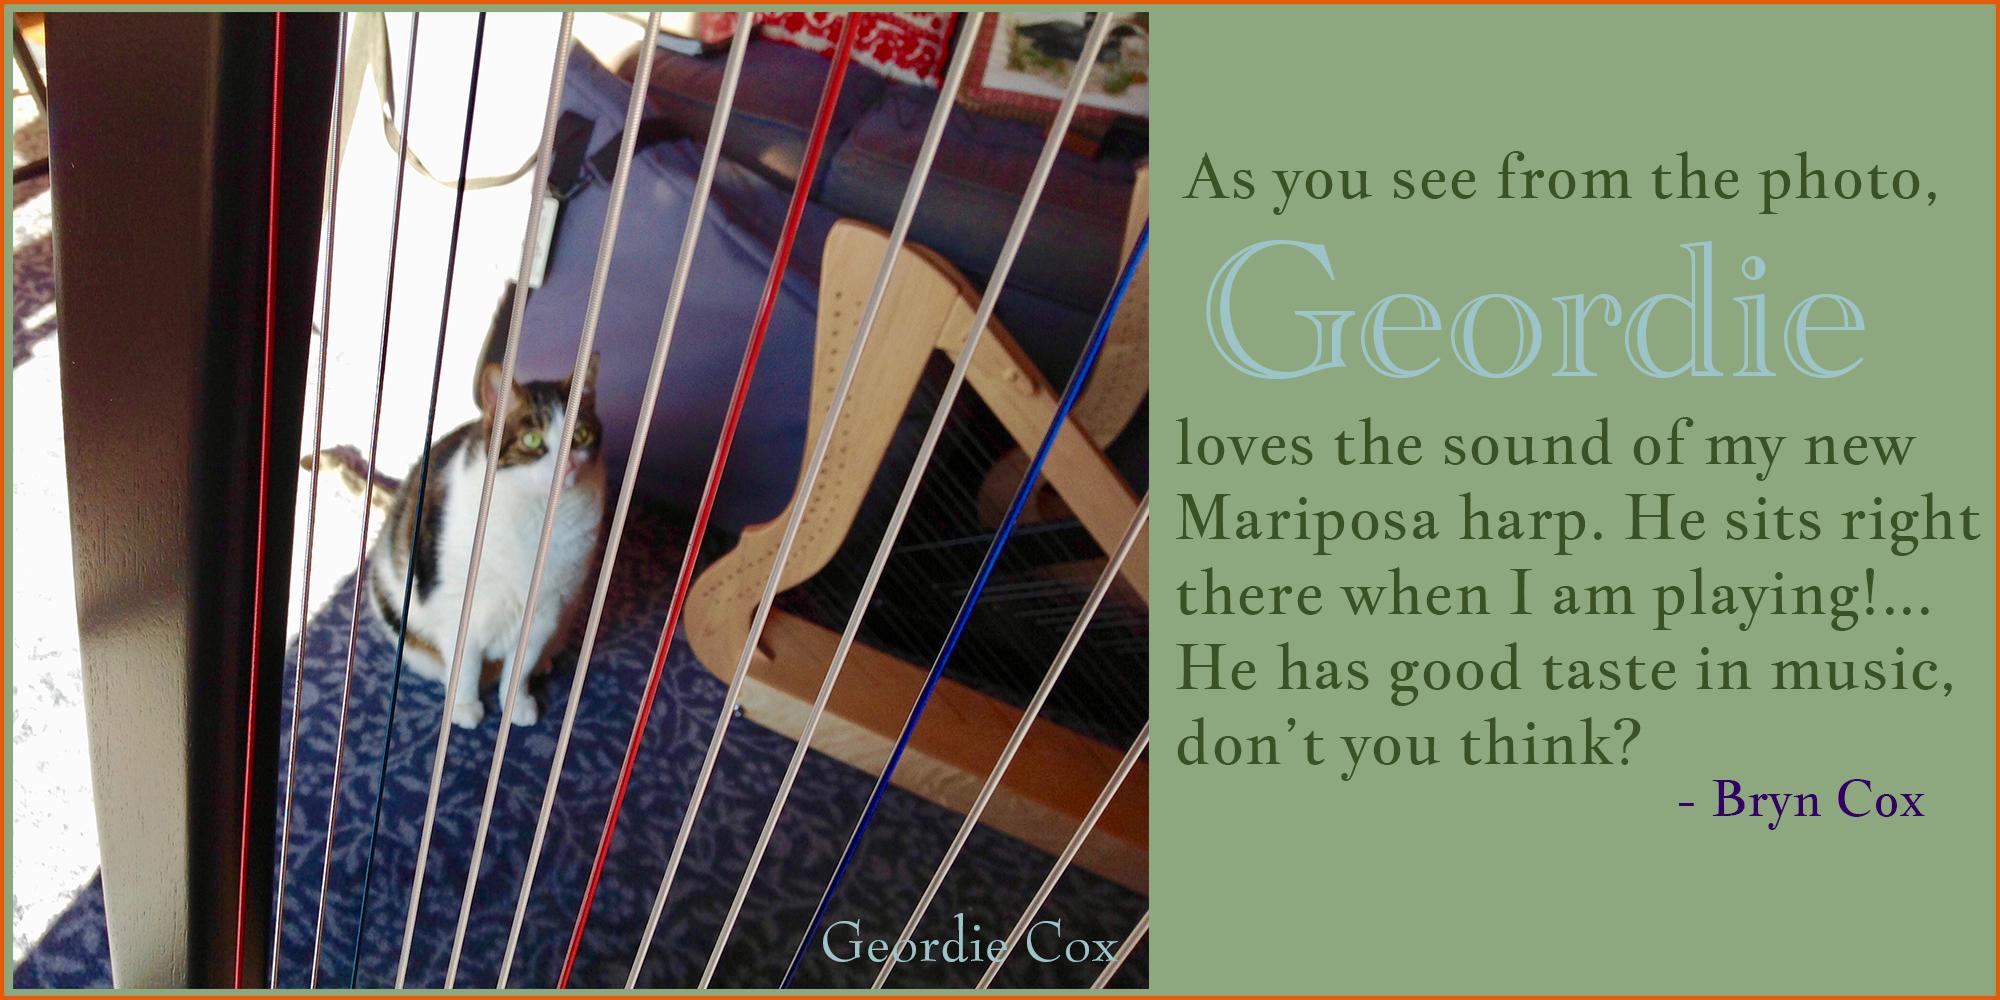 Bryn Cox' Mariposa Harp